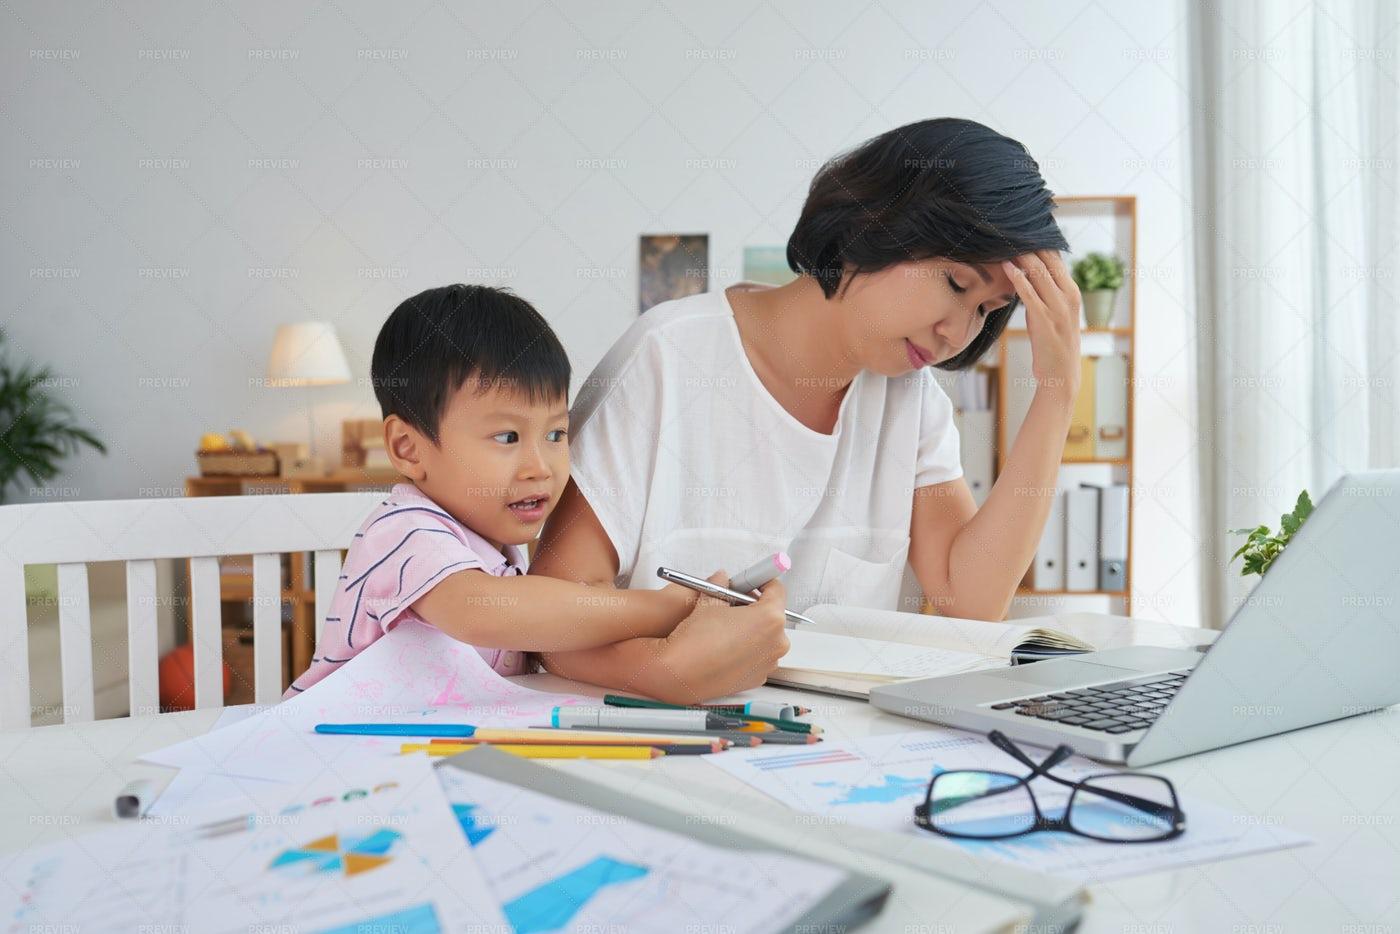 Interfering Son: Stock Photos